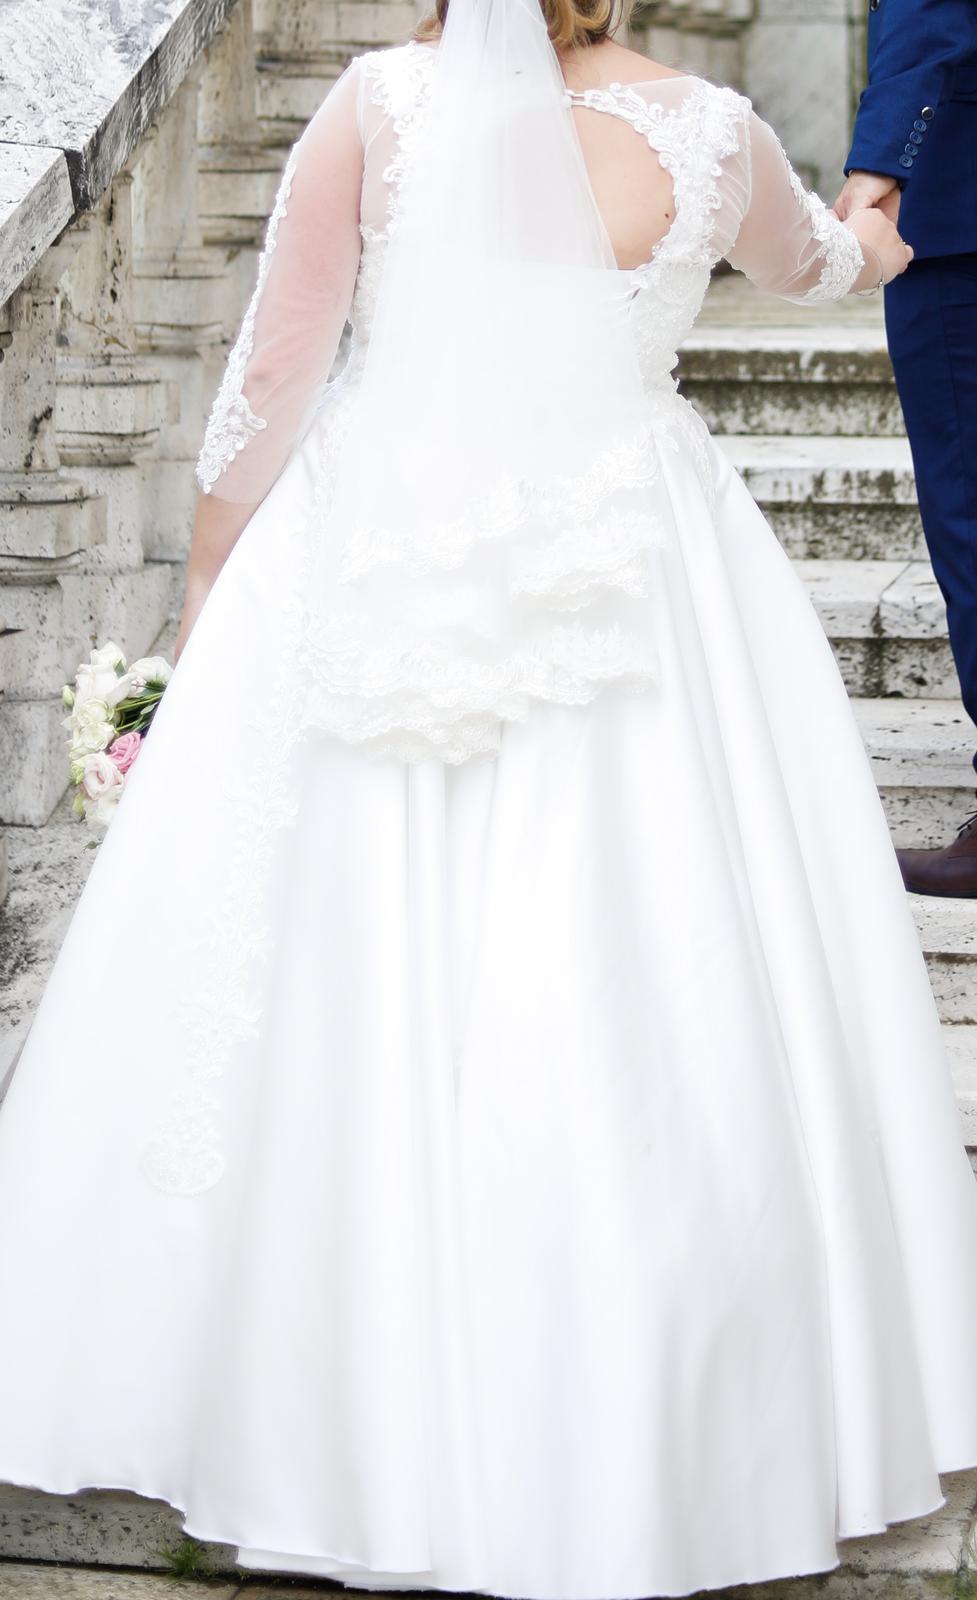 Svadobné šaty satén, čipka 46-50 - Obrázok č. 3